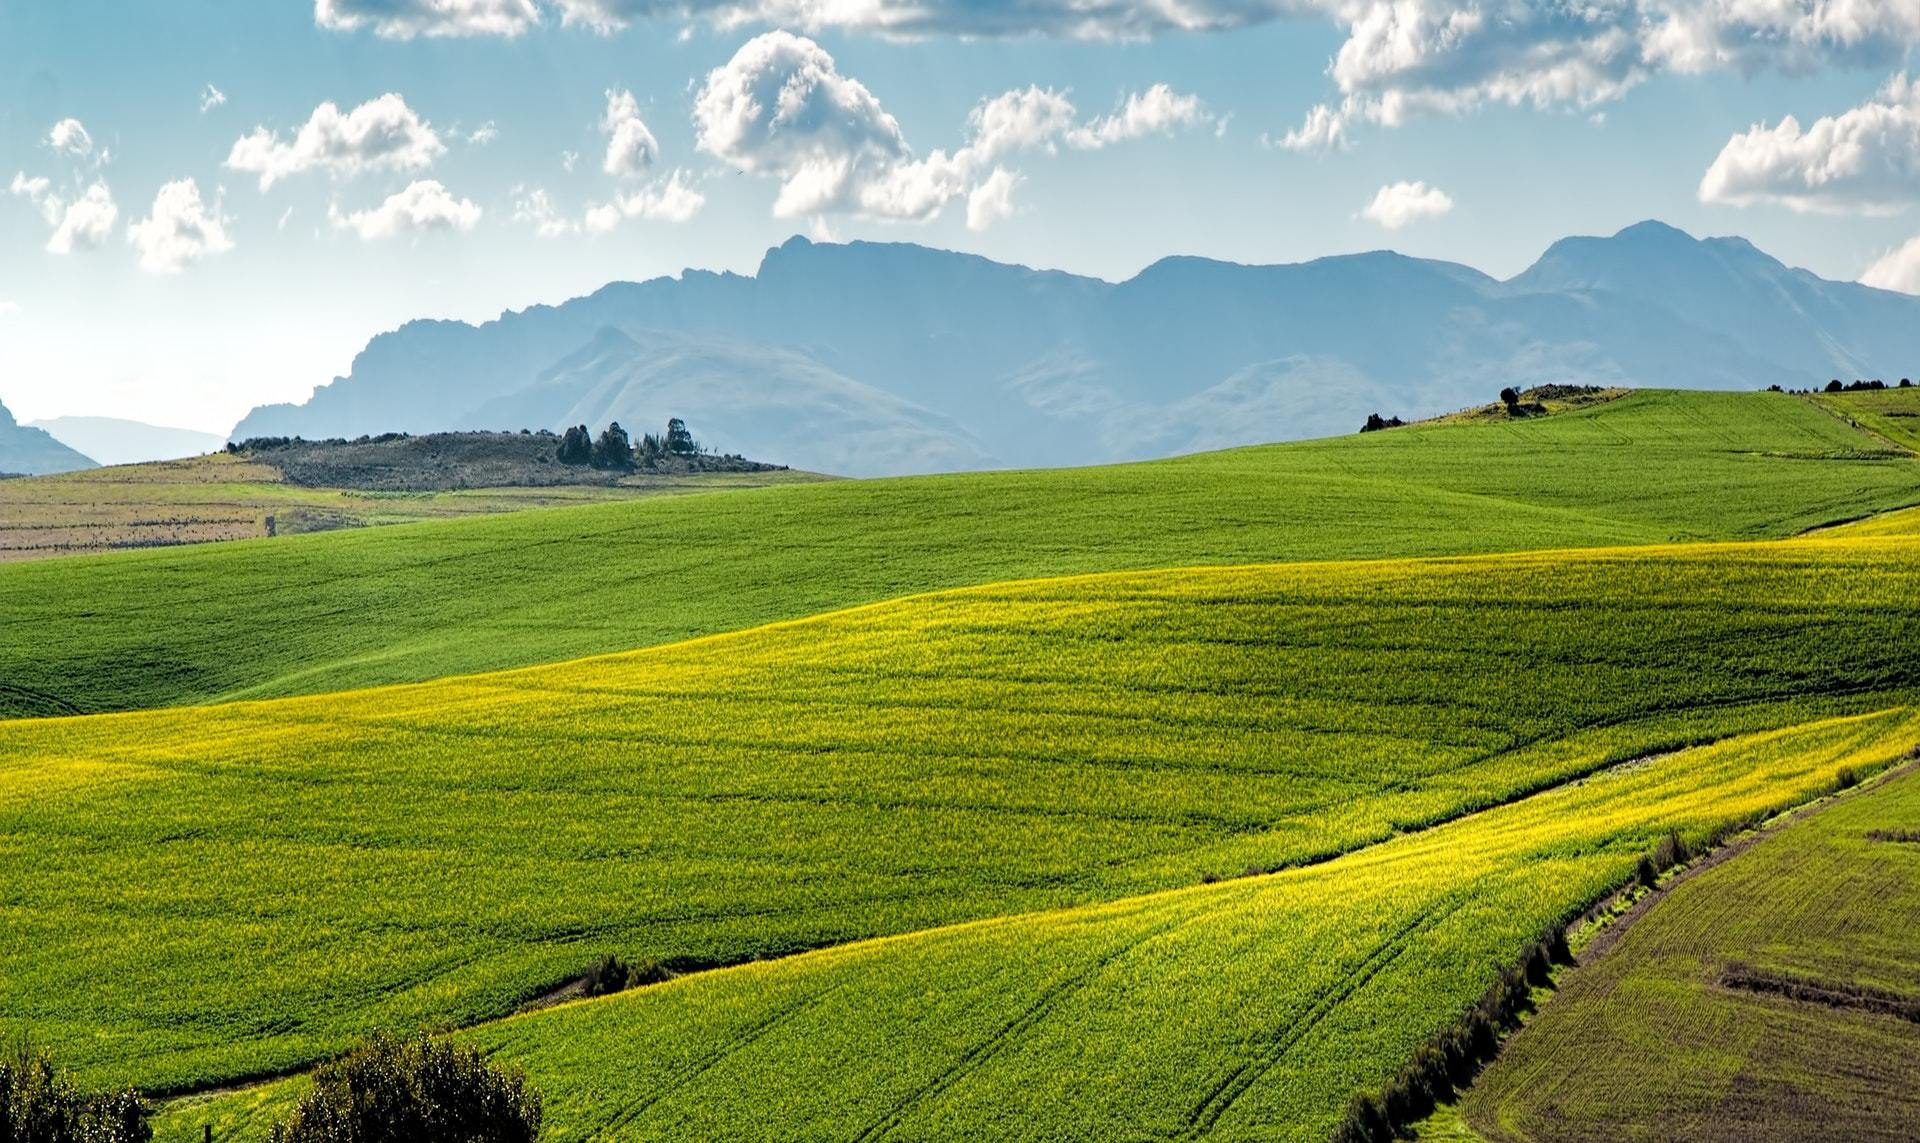 Raw Land Investment